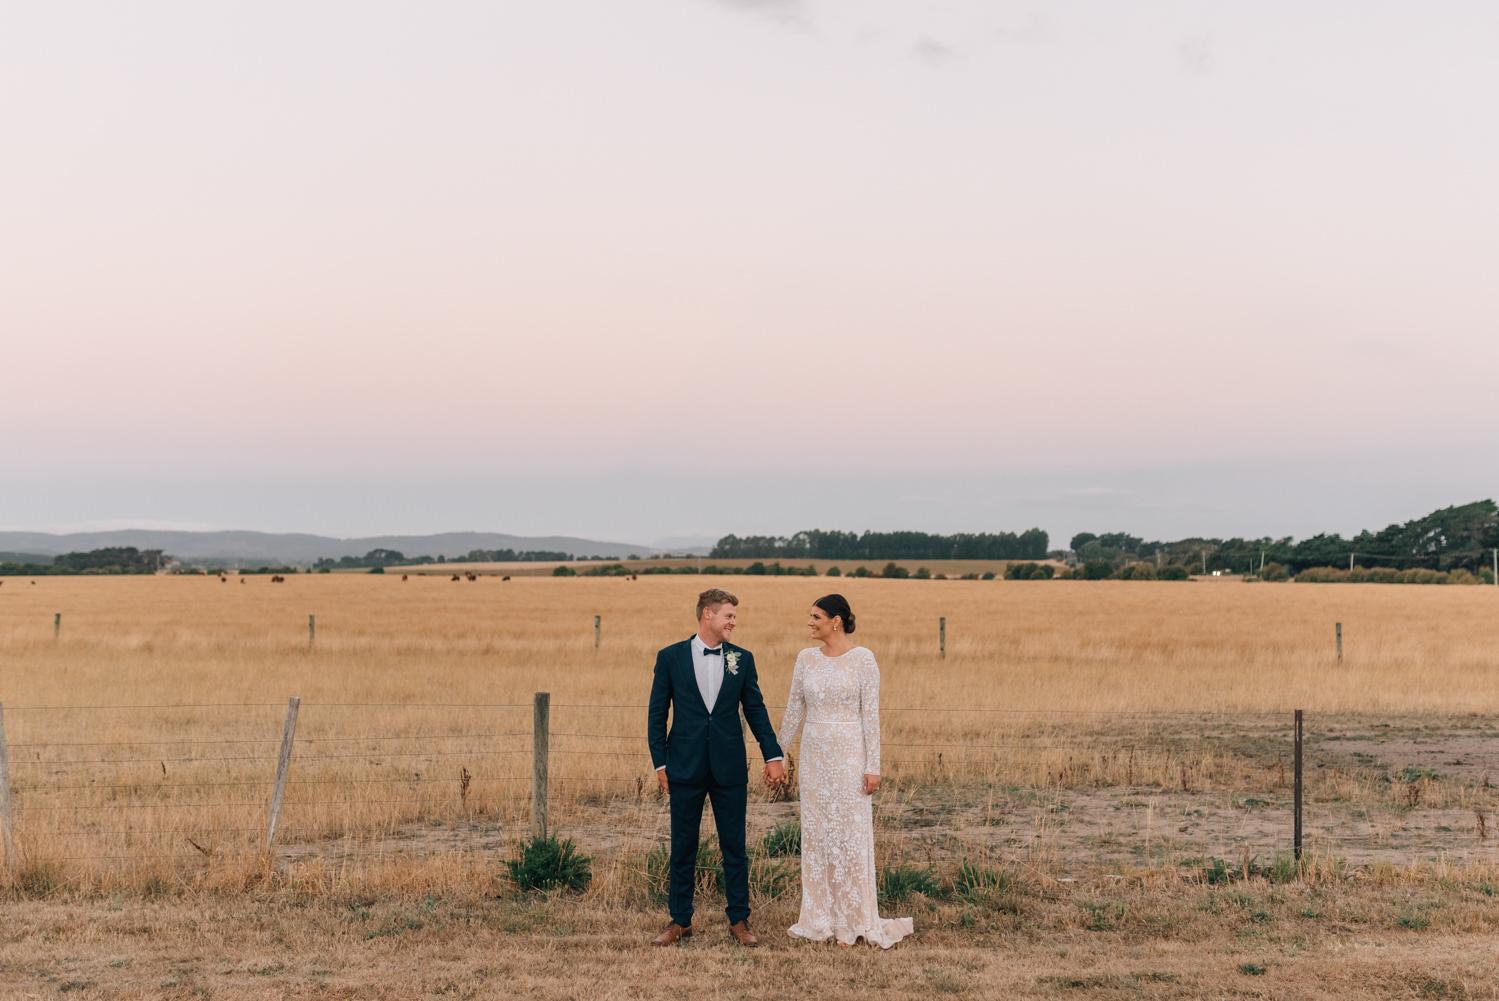 Quamby-Wedding-Photography-138.jpg